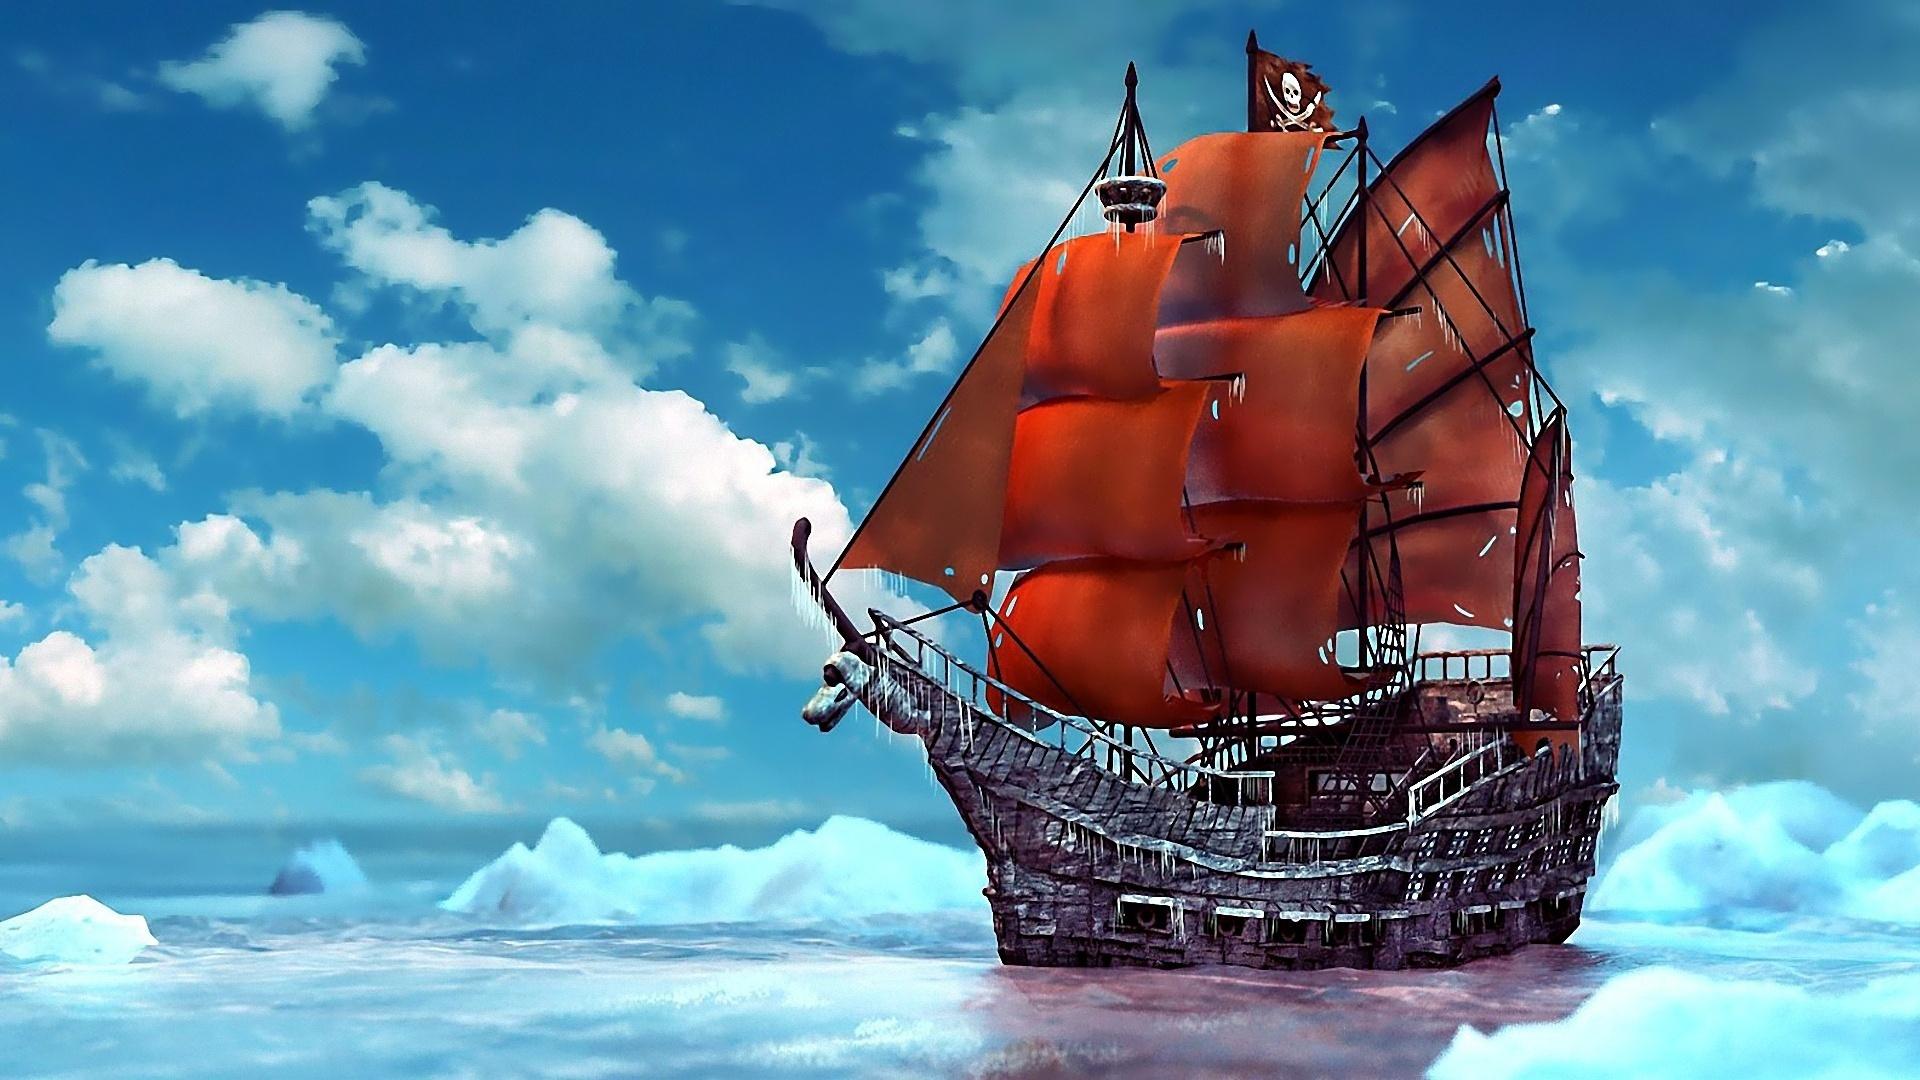 ship ships boat boats pirates ocean sea fantasy wallpaper background 1920x1080